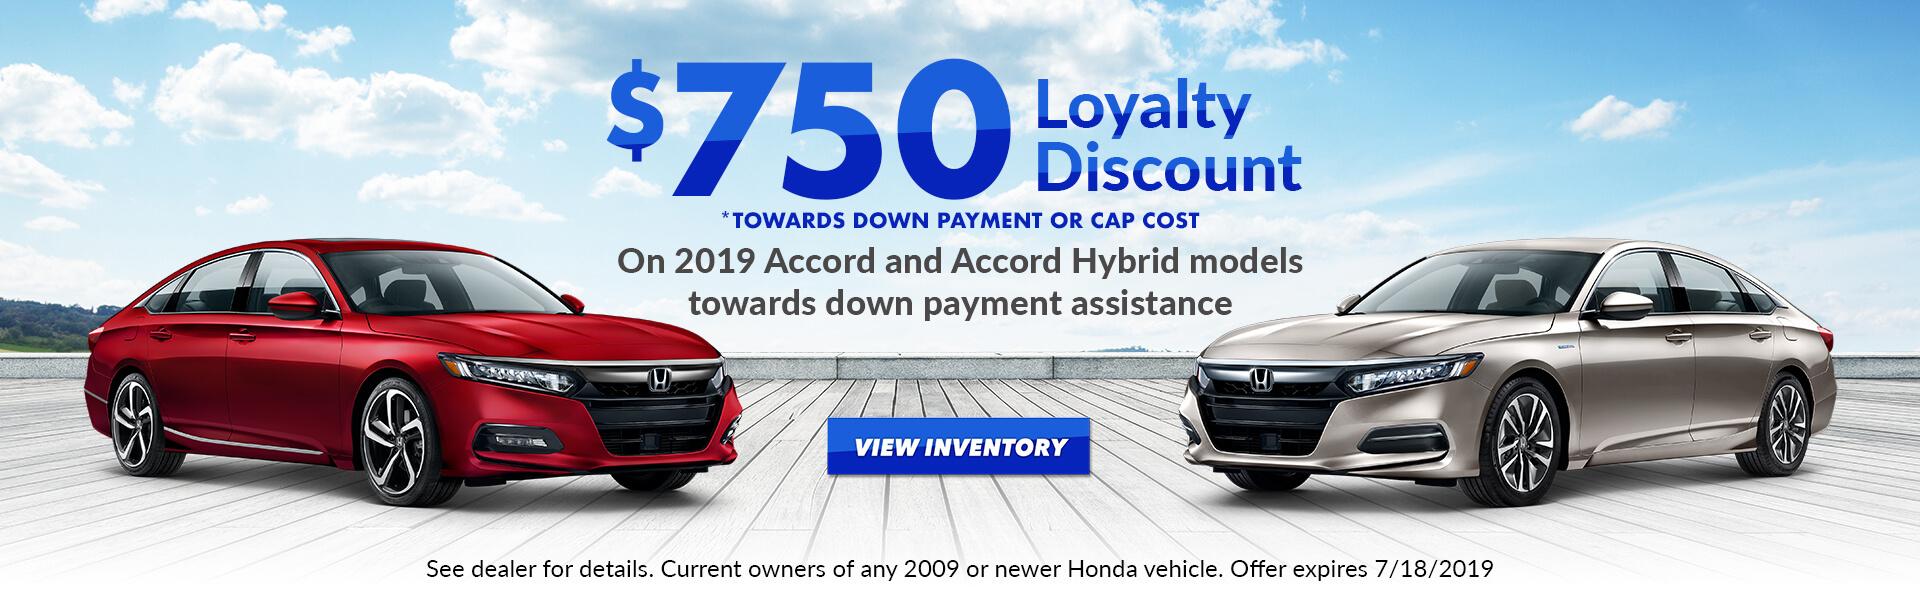 Accord/Accord Hybrid $750